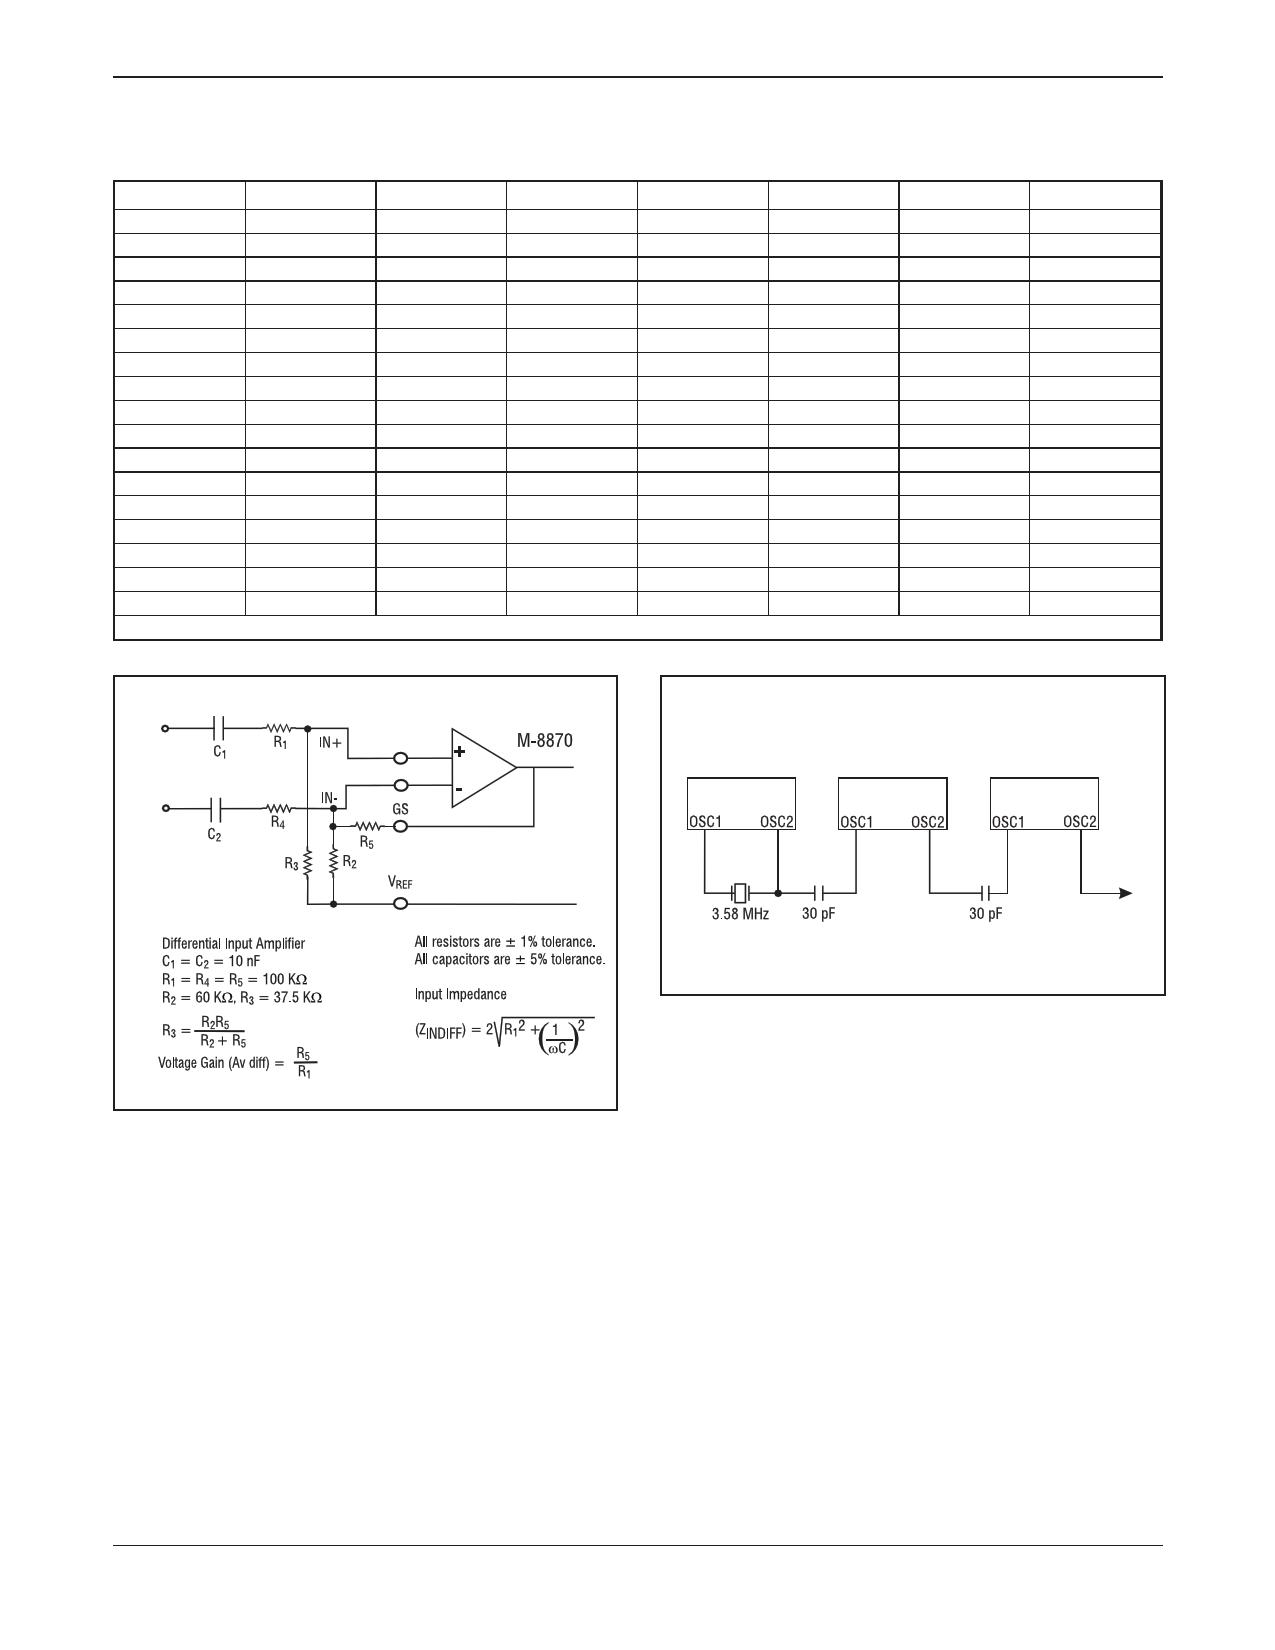 M-8870 pdf, arduino